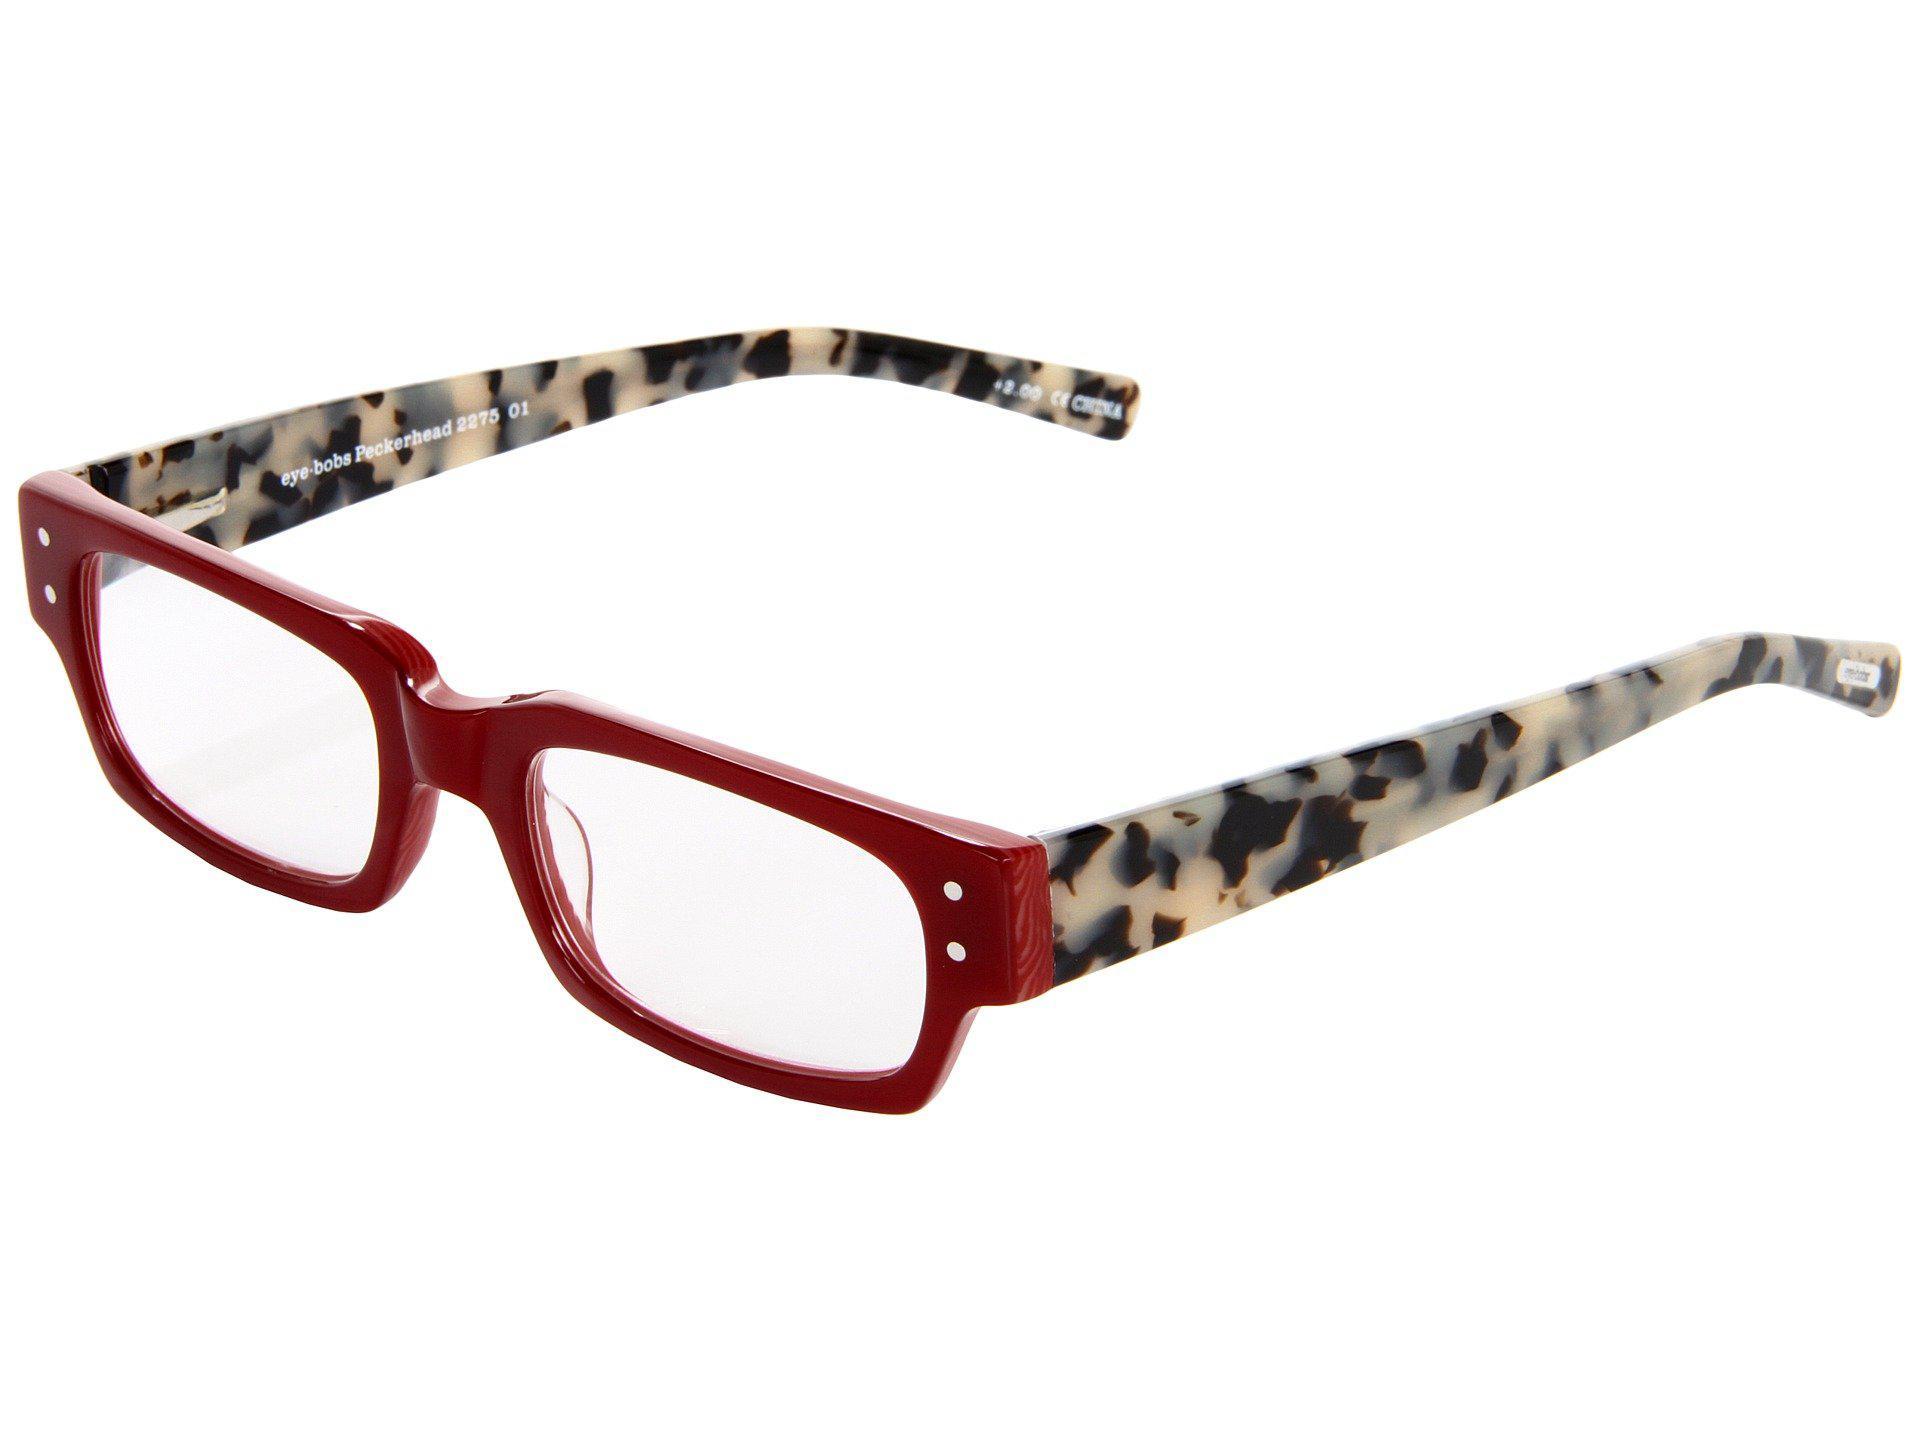 b0673467a18 Lyst - Eyebobs Peckerhead Readers (blue Stripe) Reading Glasses ...